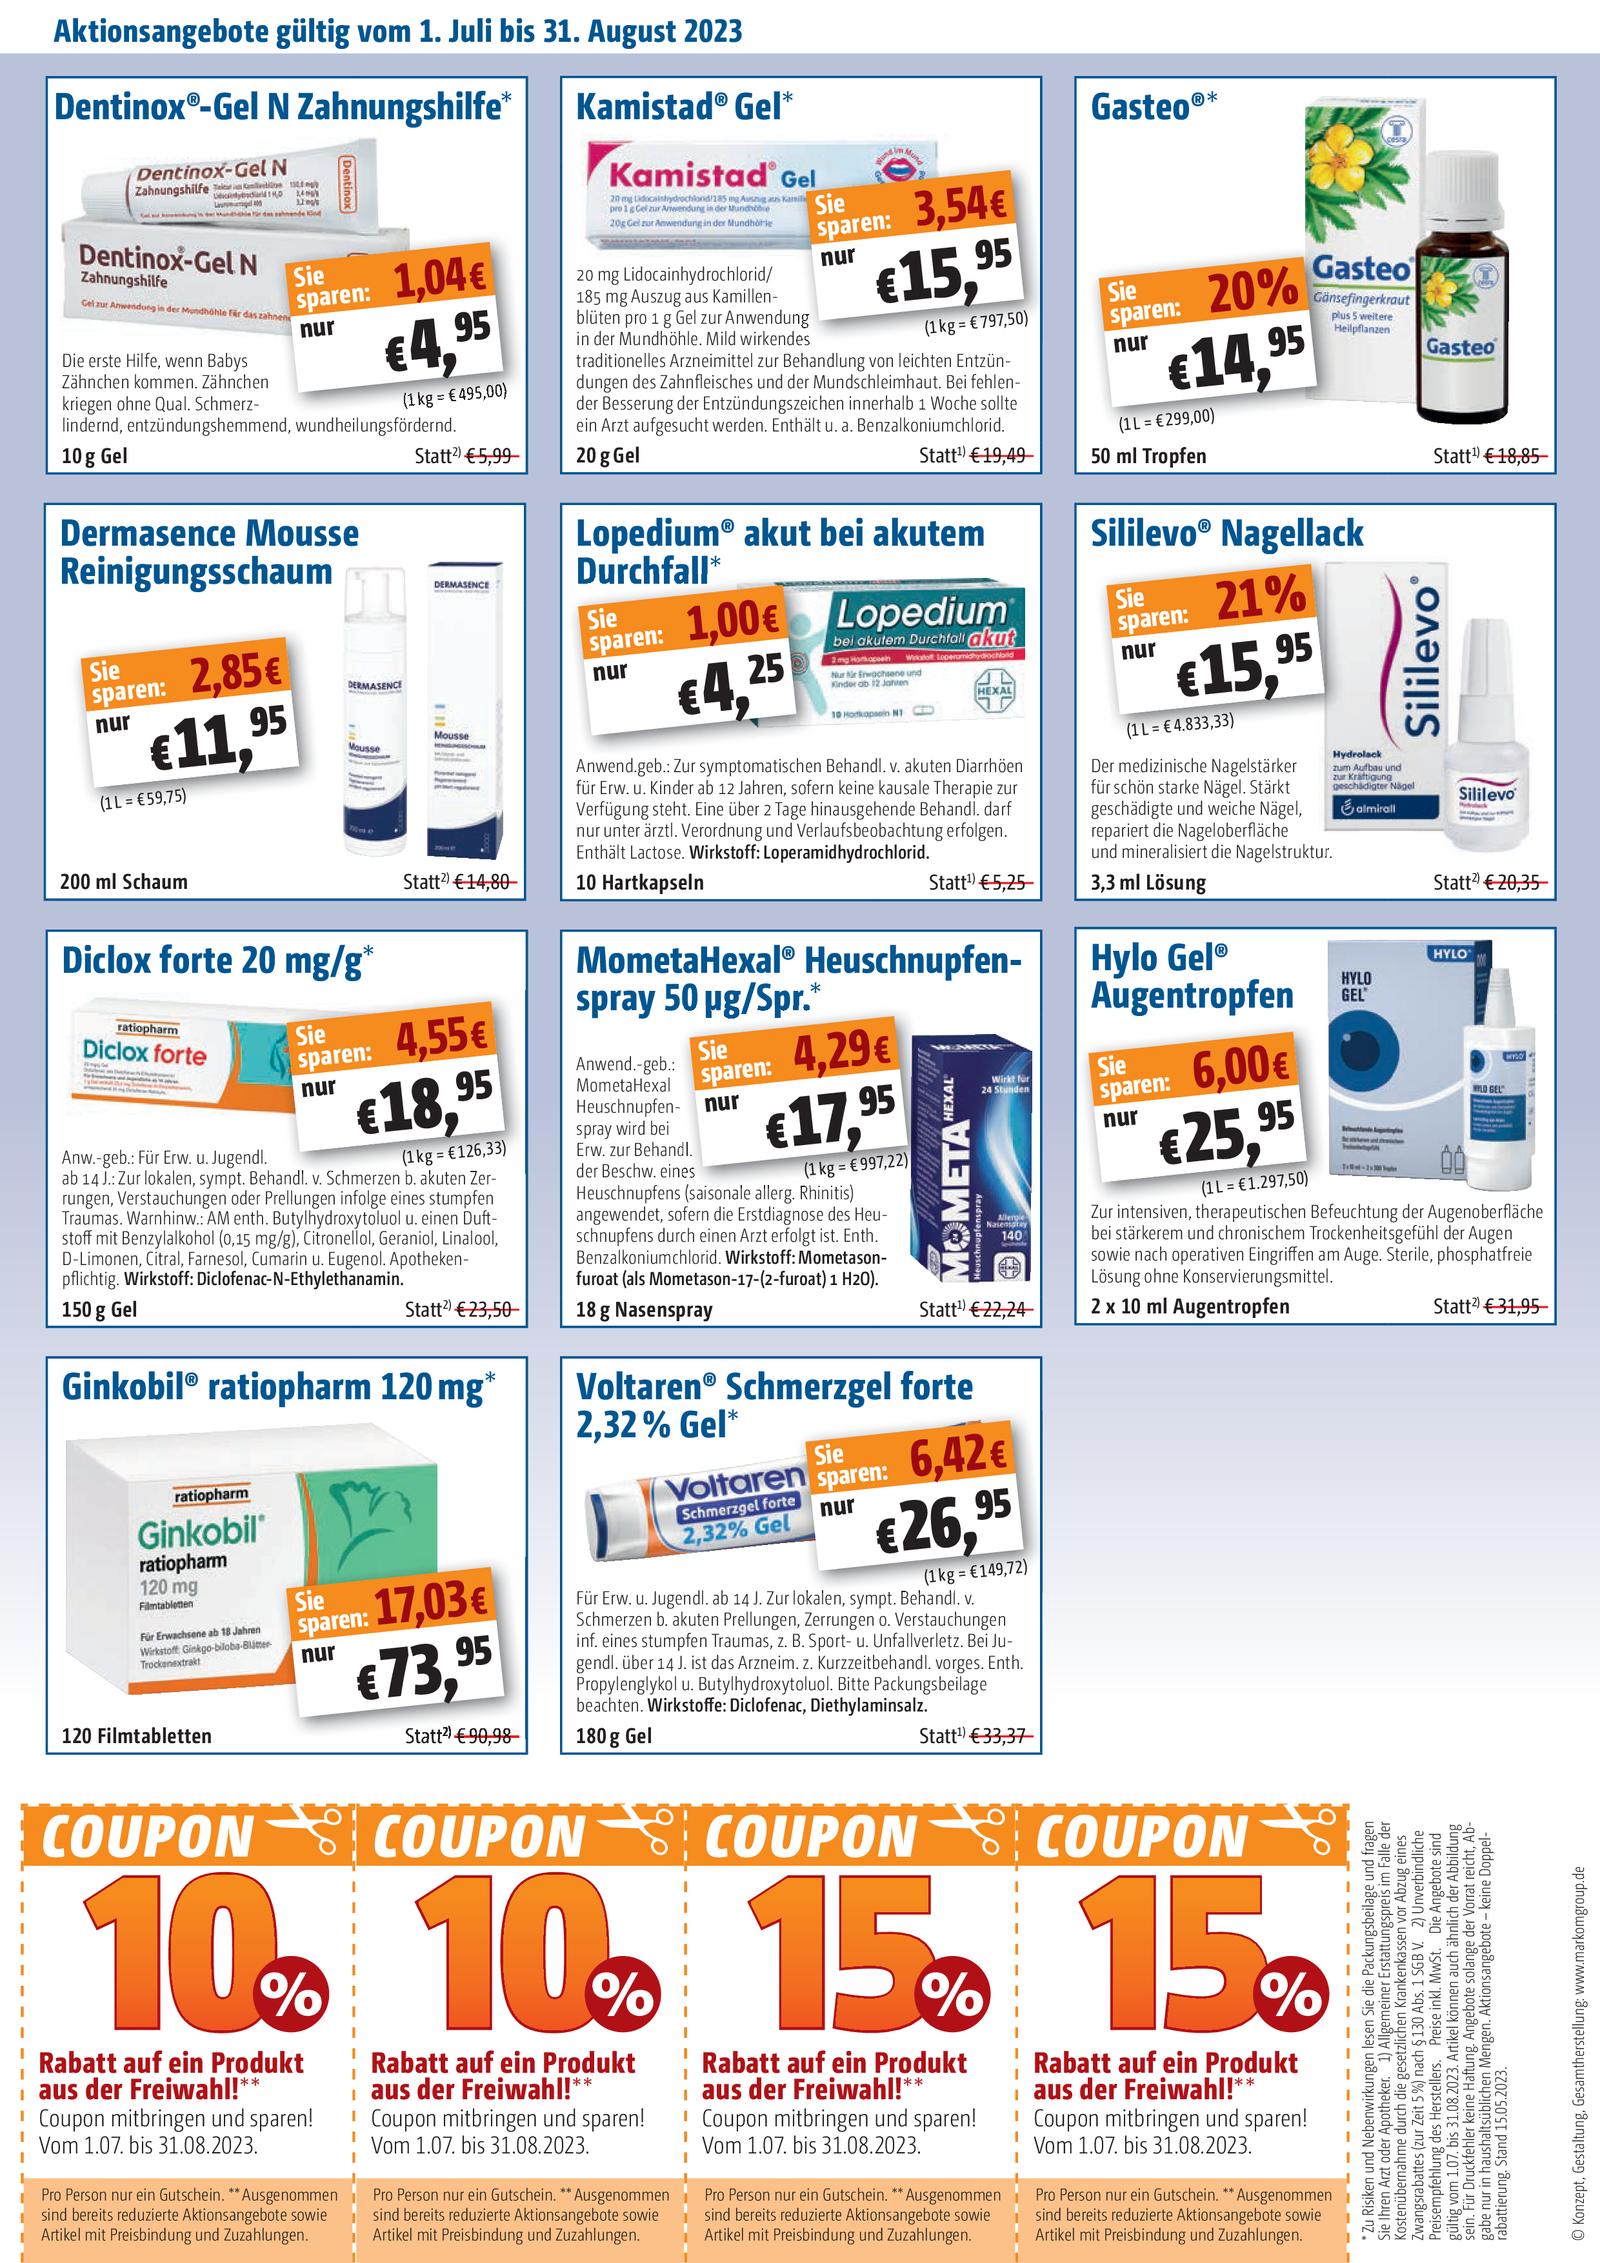 https://mein-uploads.apocdn.net/4627/leaflets/4627_flyer-Seite2.png